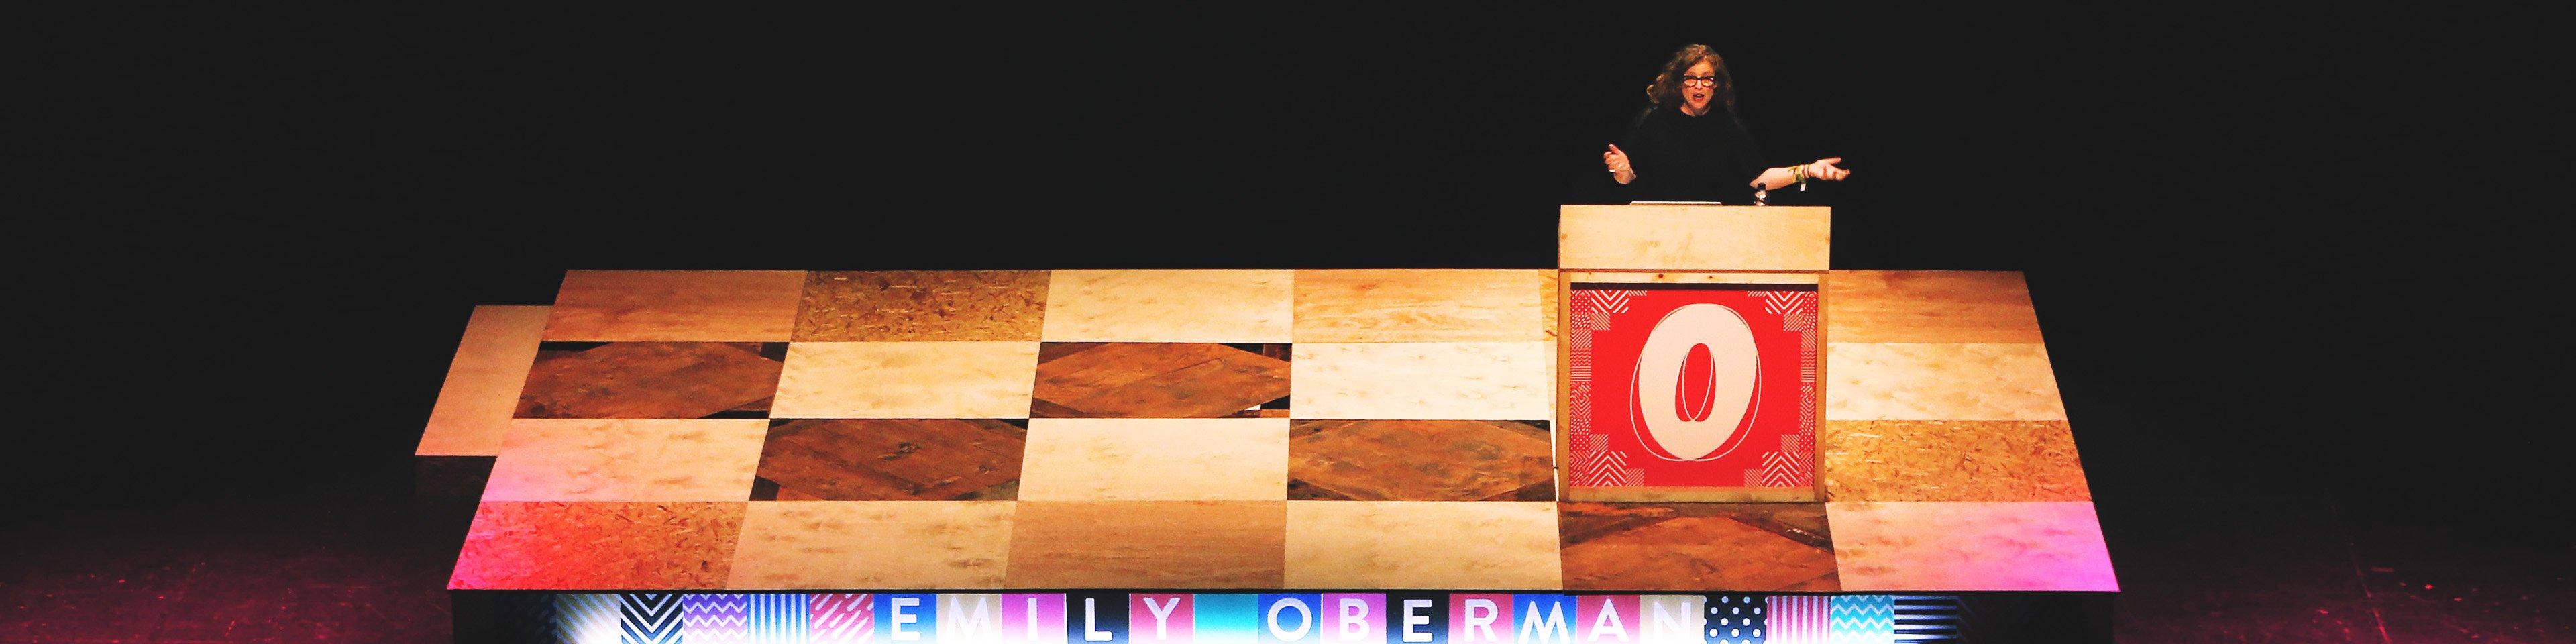 Emily Oberman at OFFSET 2015